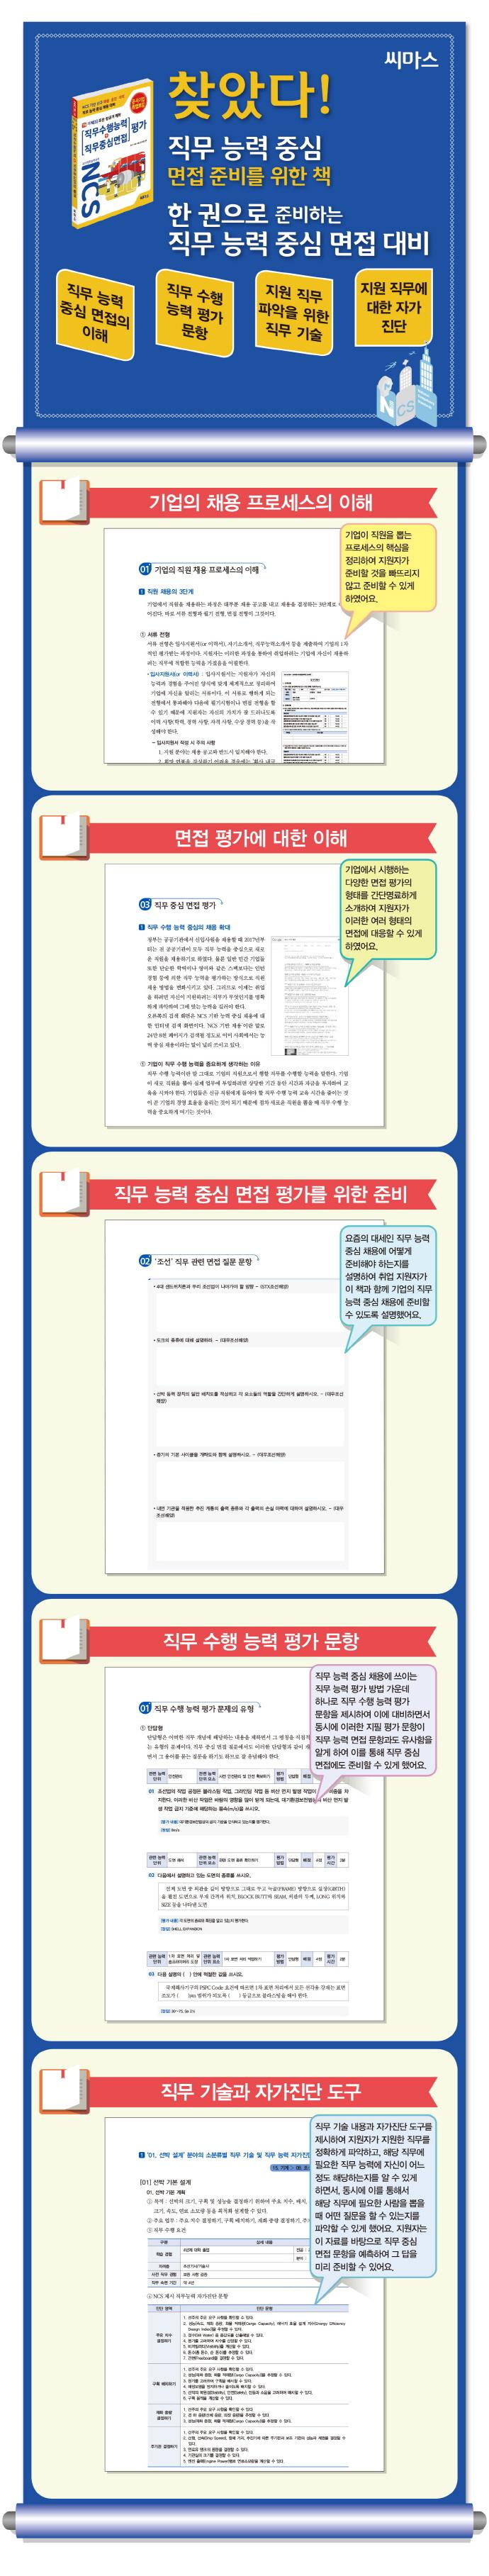 NCS 기반 직무수행능력+직무중심면접 평가. 15: 기계(3) 조선 항공기 제작 도서 상세이미지